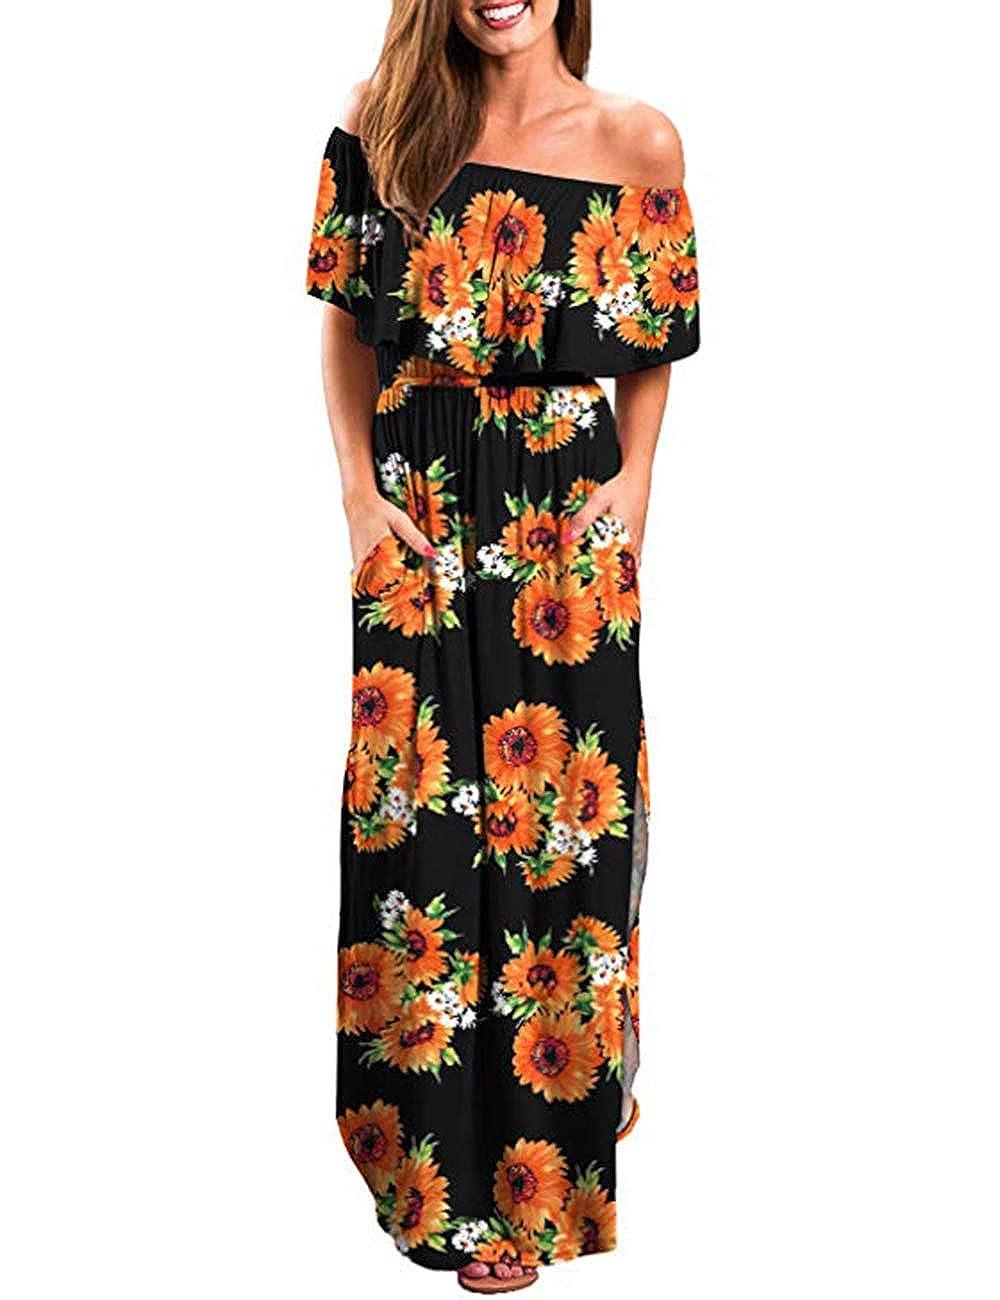 AKEWEI Women Maxi Dresses Summer V Neck Short Sleeve Long Dress with Pocket Beach Skirt Cover Up Slits